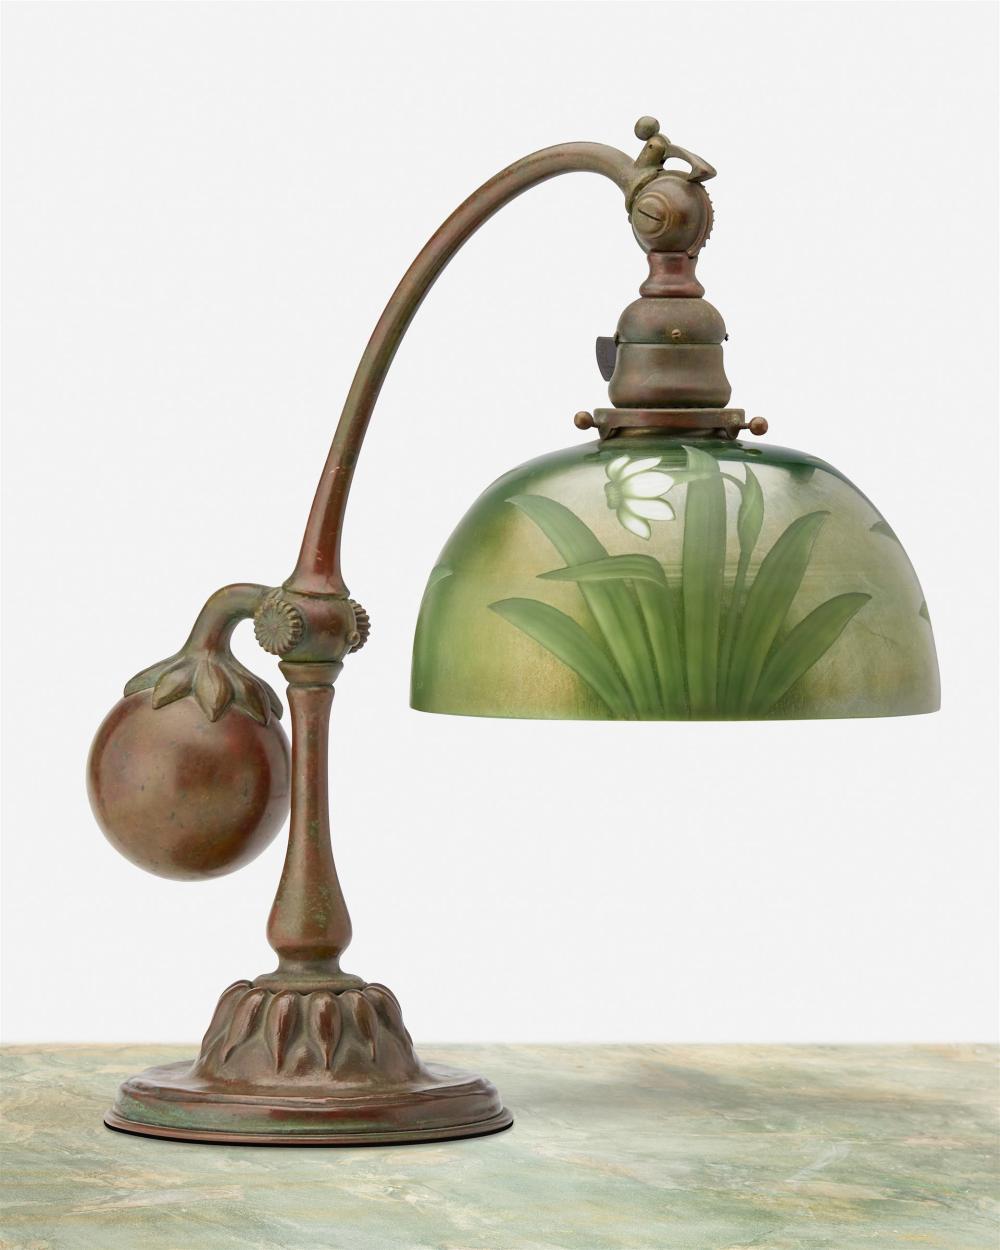 A Tiffany Studios counter-balance desk lamp with intaglio shade